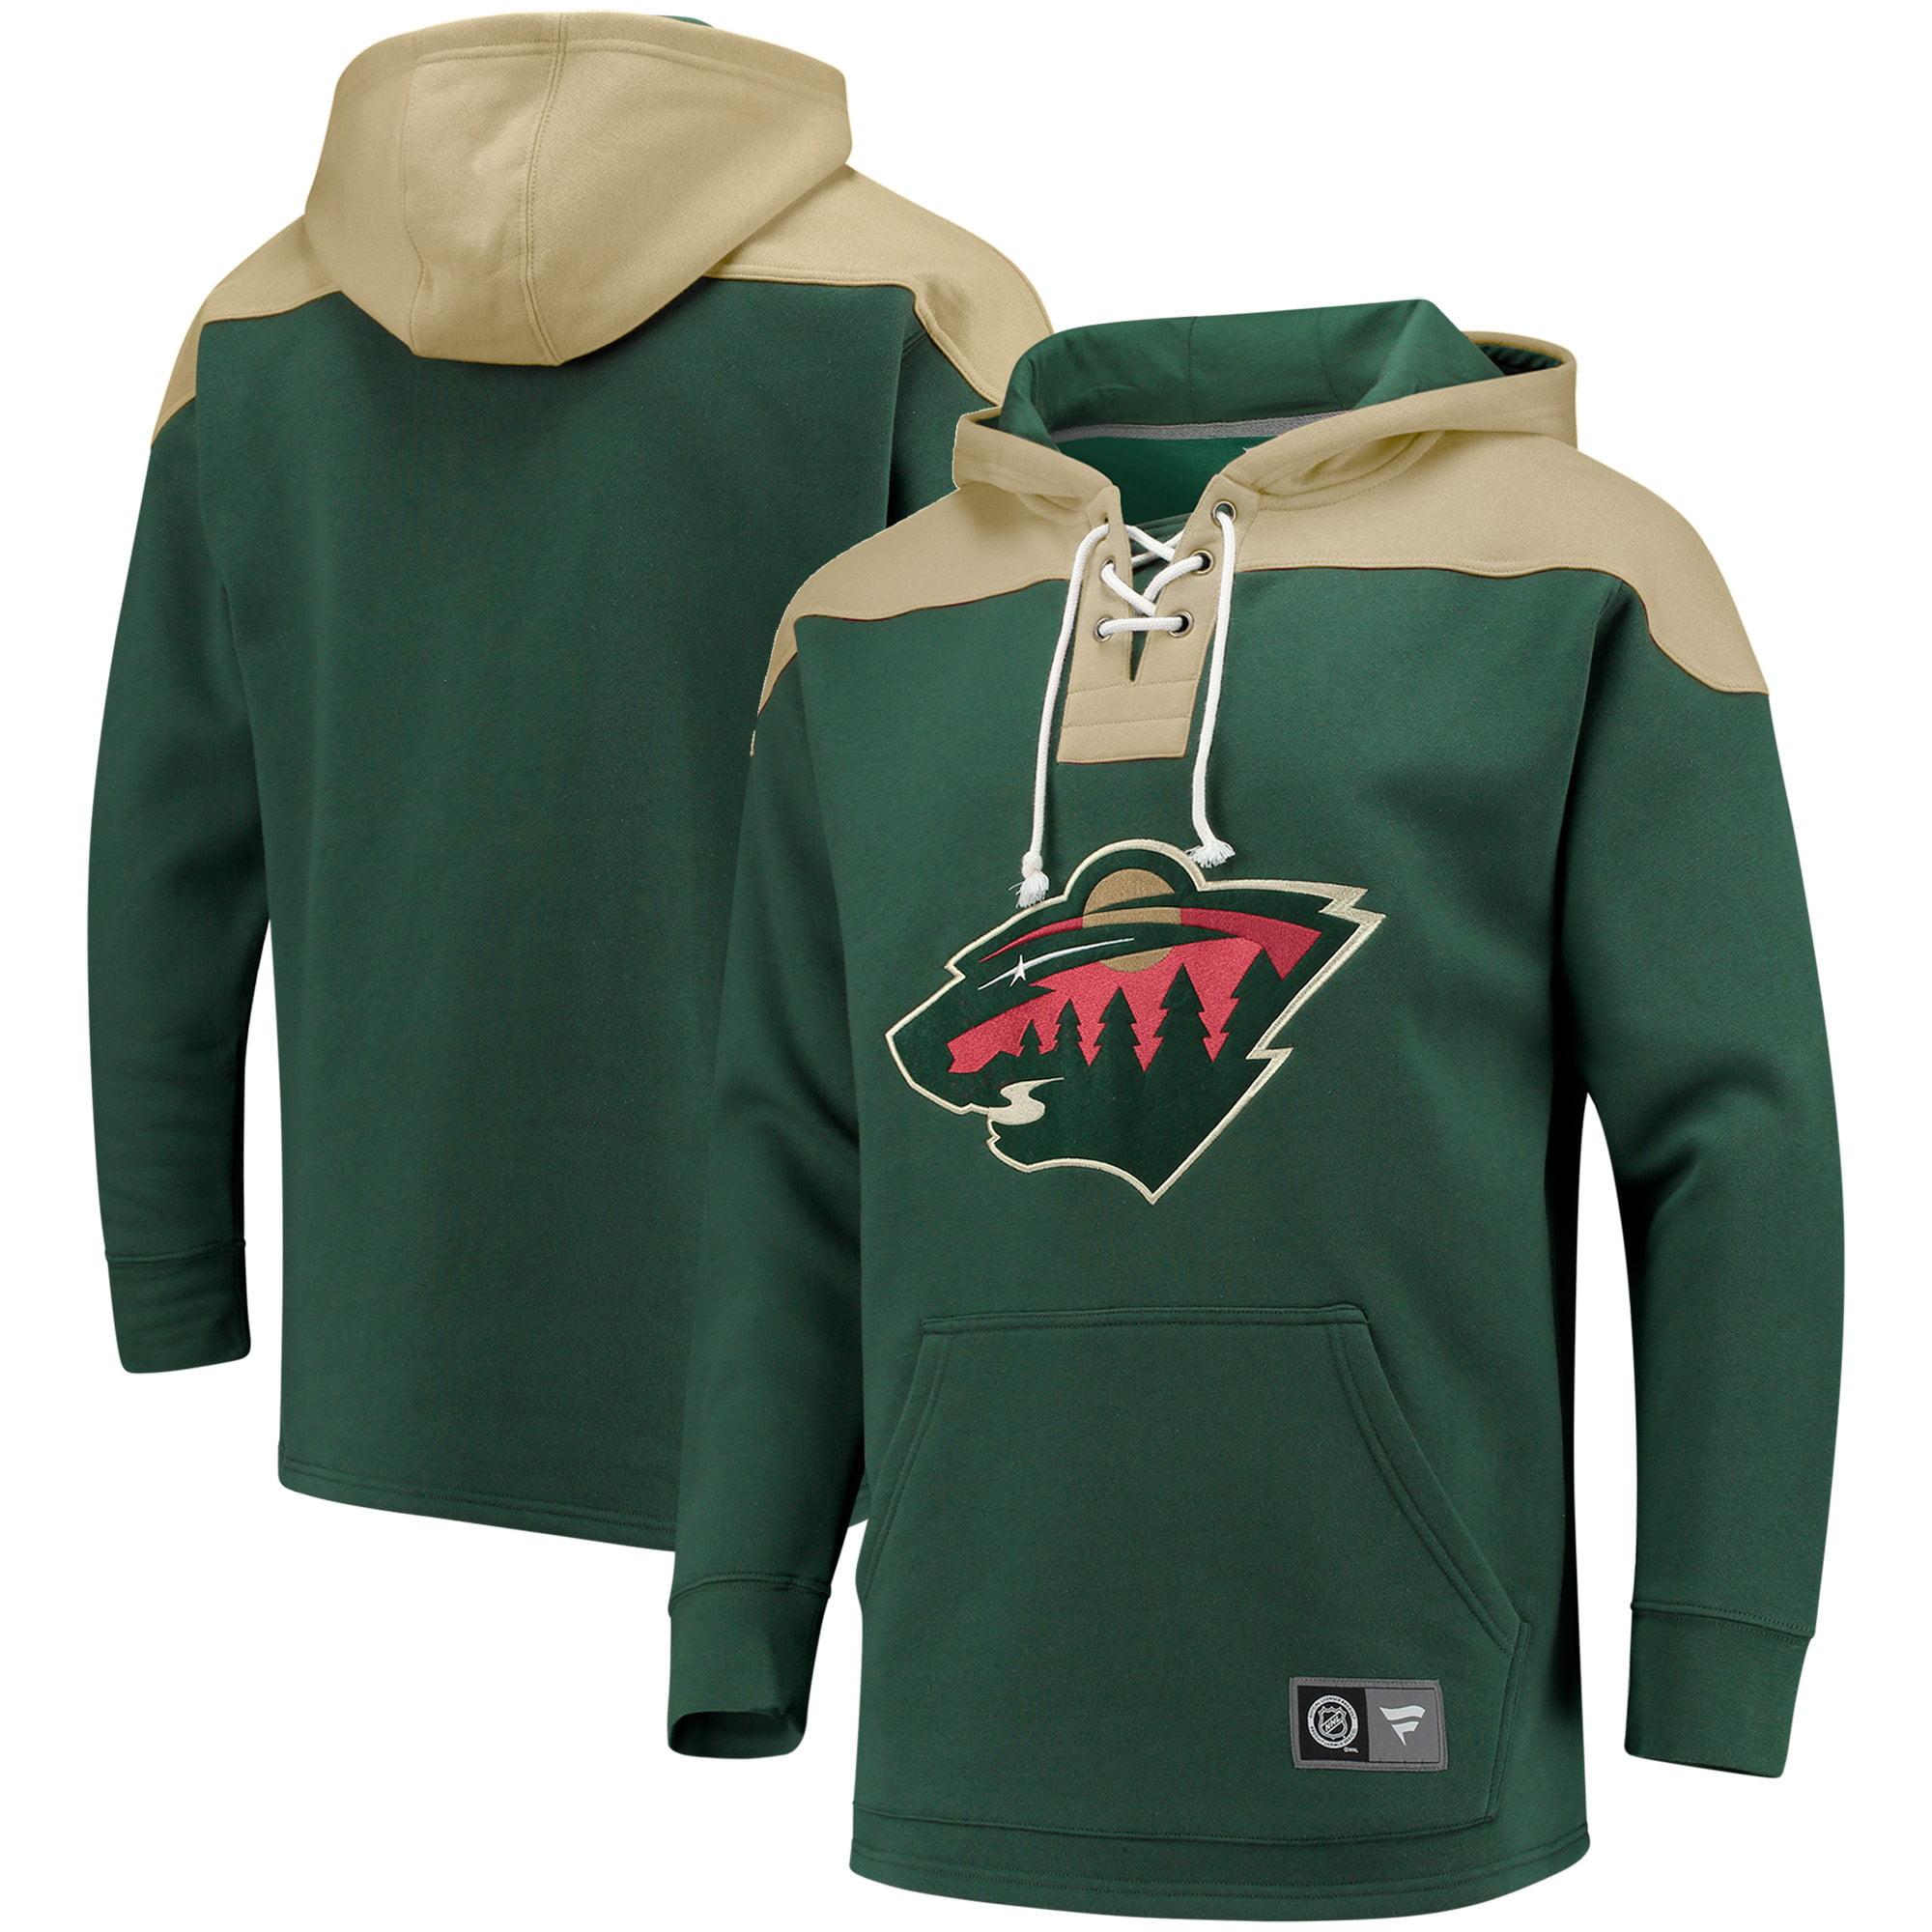 Minnesota Wild Fanatics Branded Breakaway Lace Up Hoodie - Green/Red